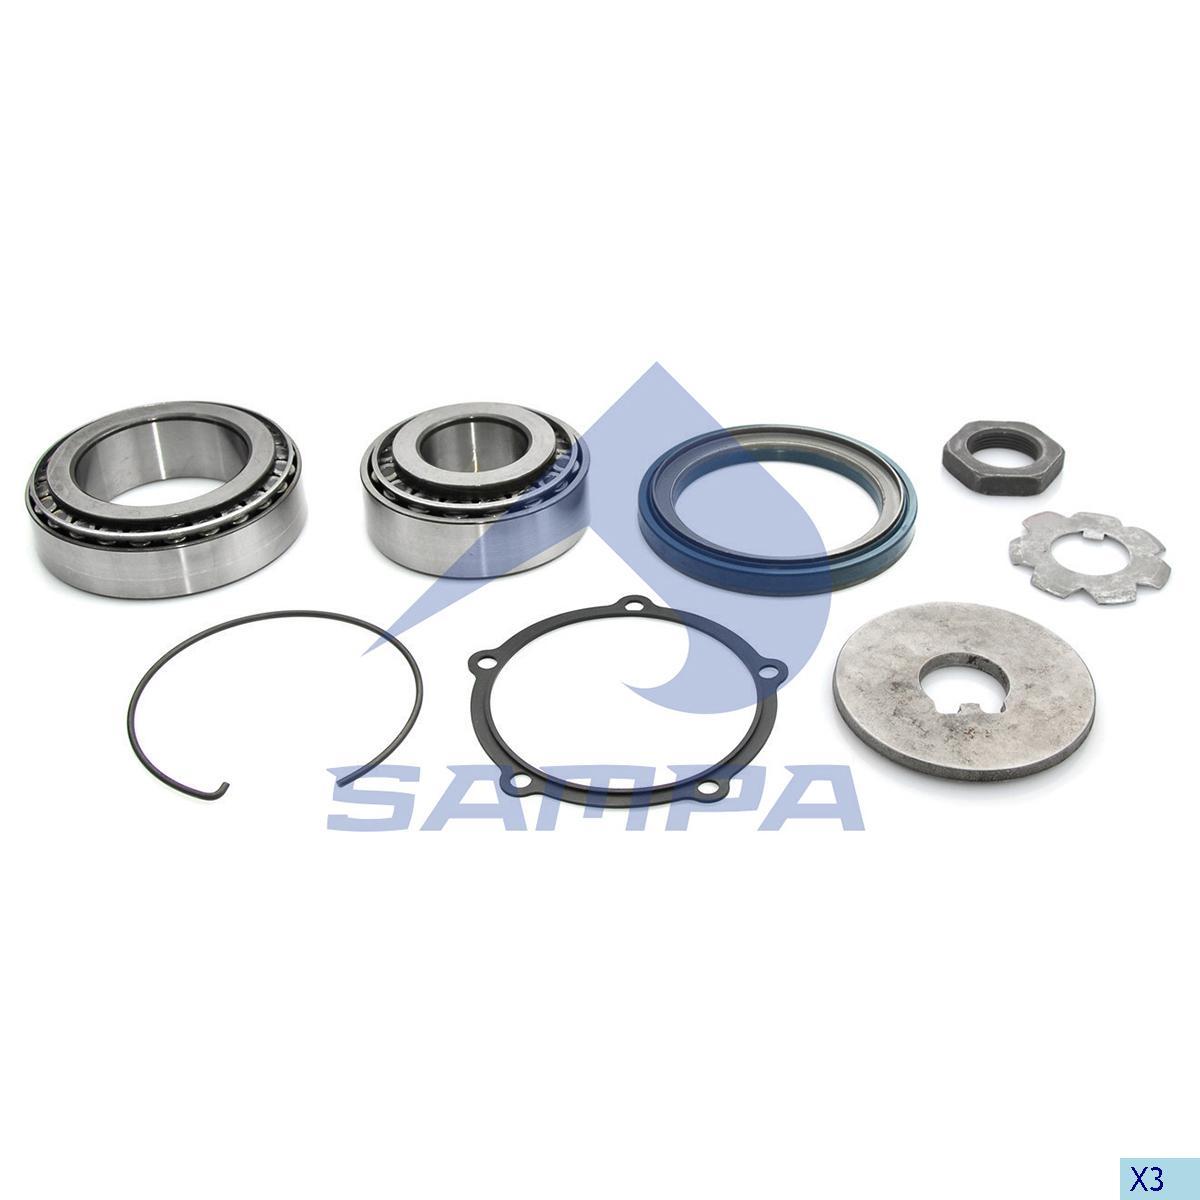 Repair Kit, Axle, Ror-Meritor, Power Unit